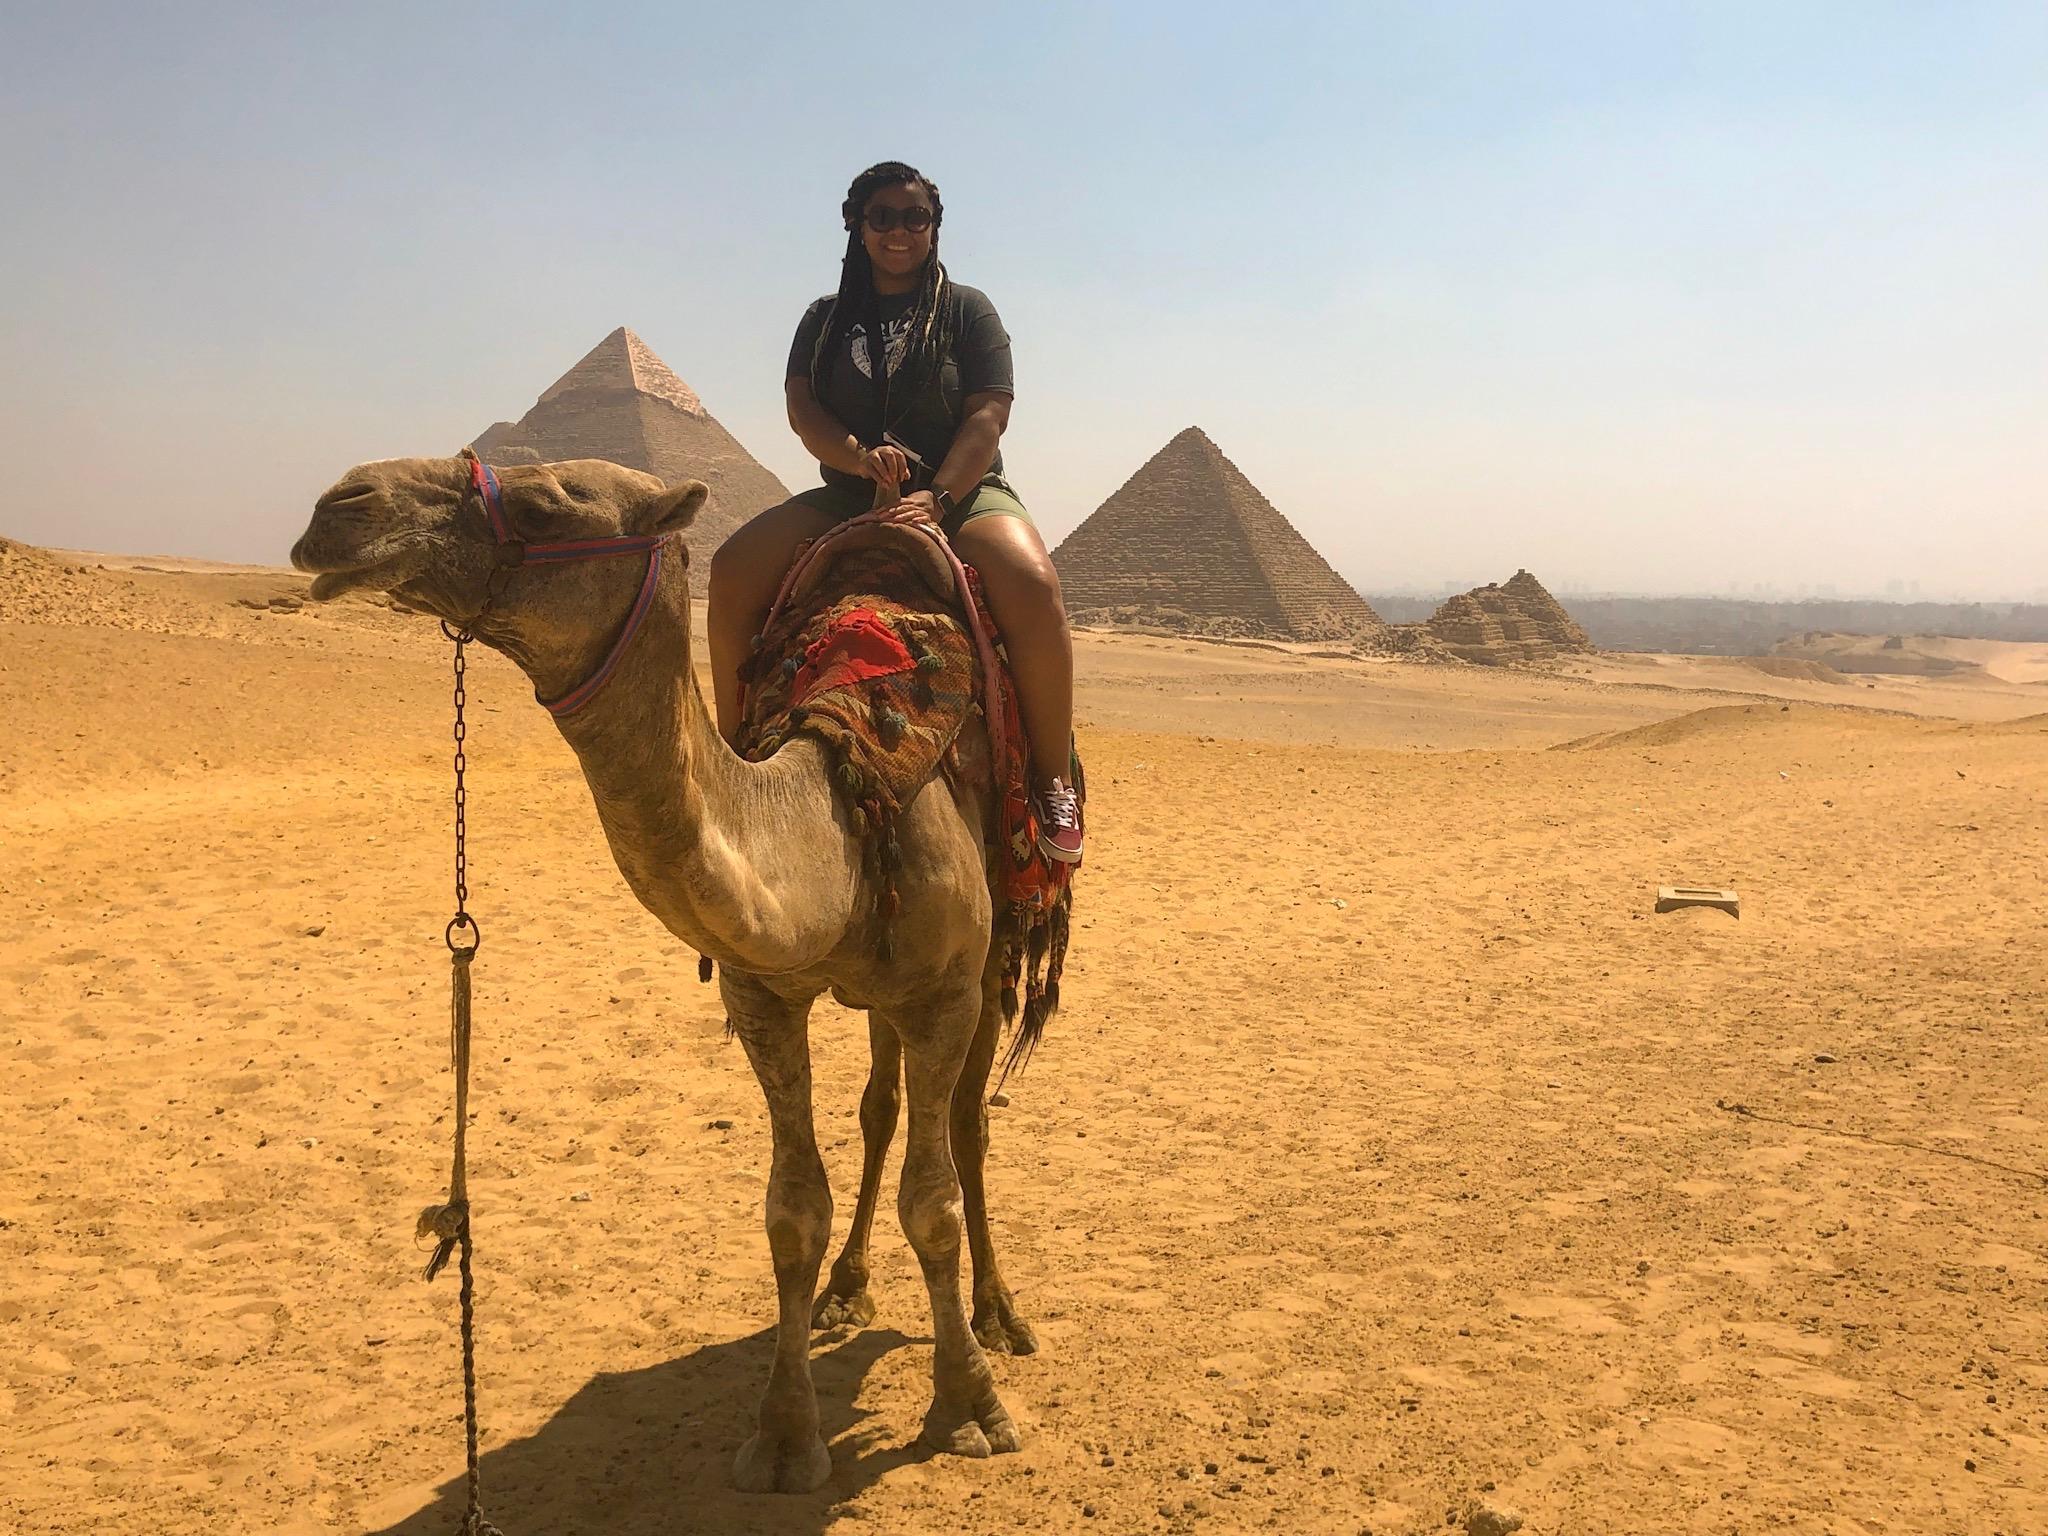 Riding a camel at the Pyramids of Giza.